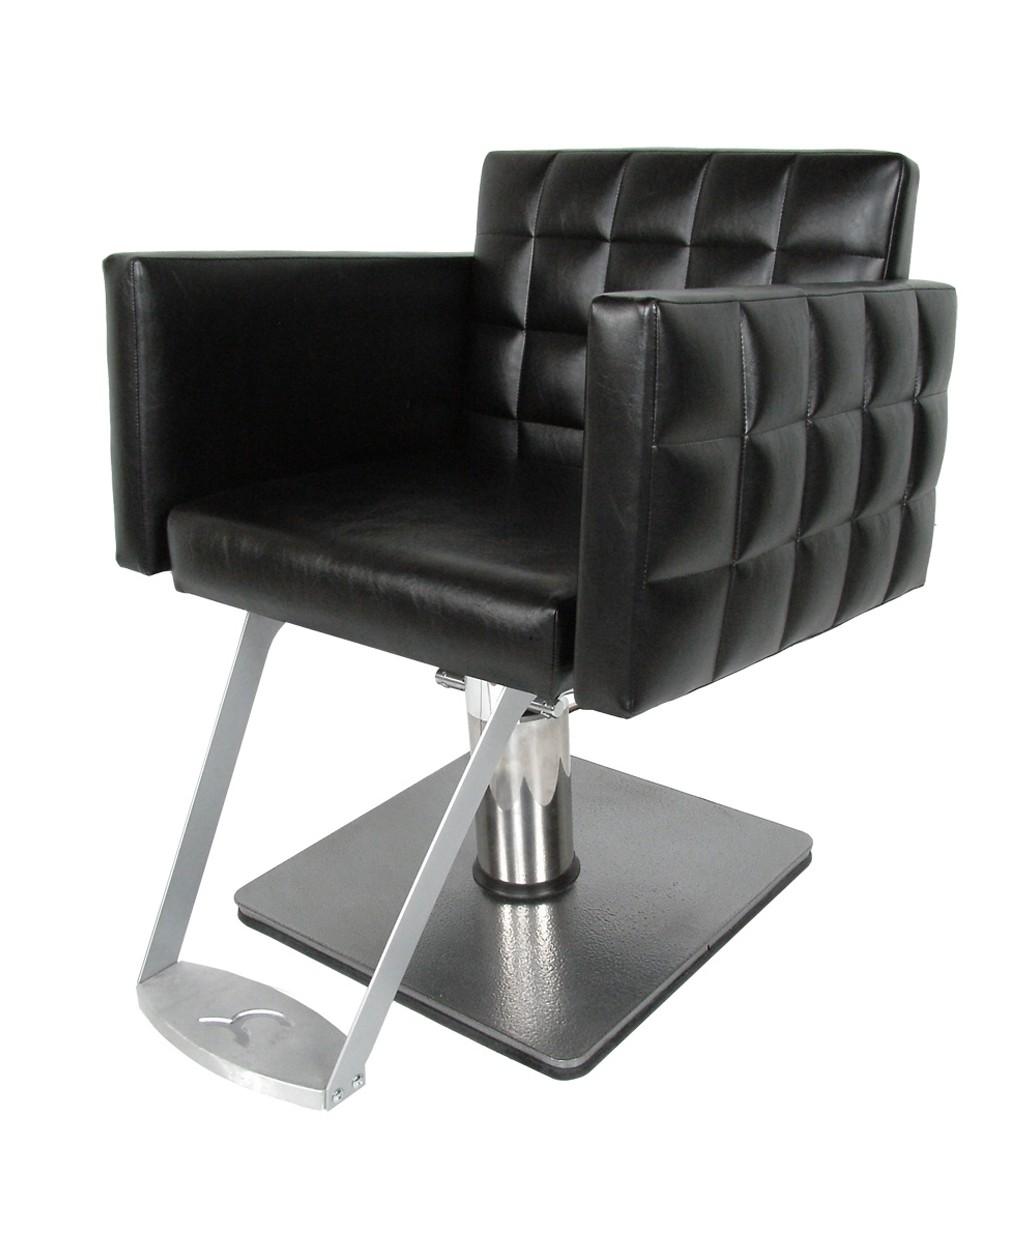 Hydraulic Styling Chair collins 6800 nouveau hydraulic salon styling chair